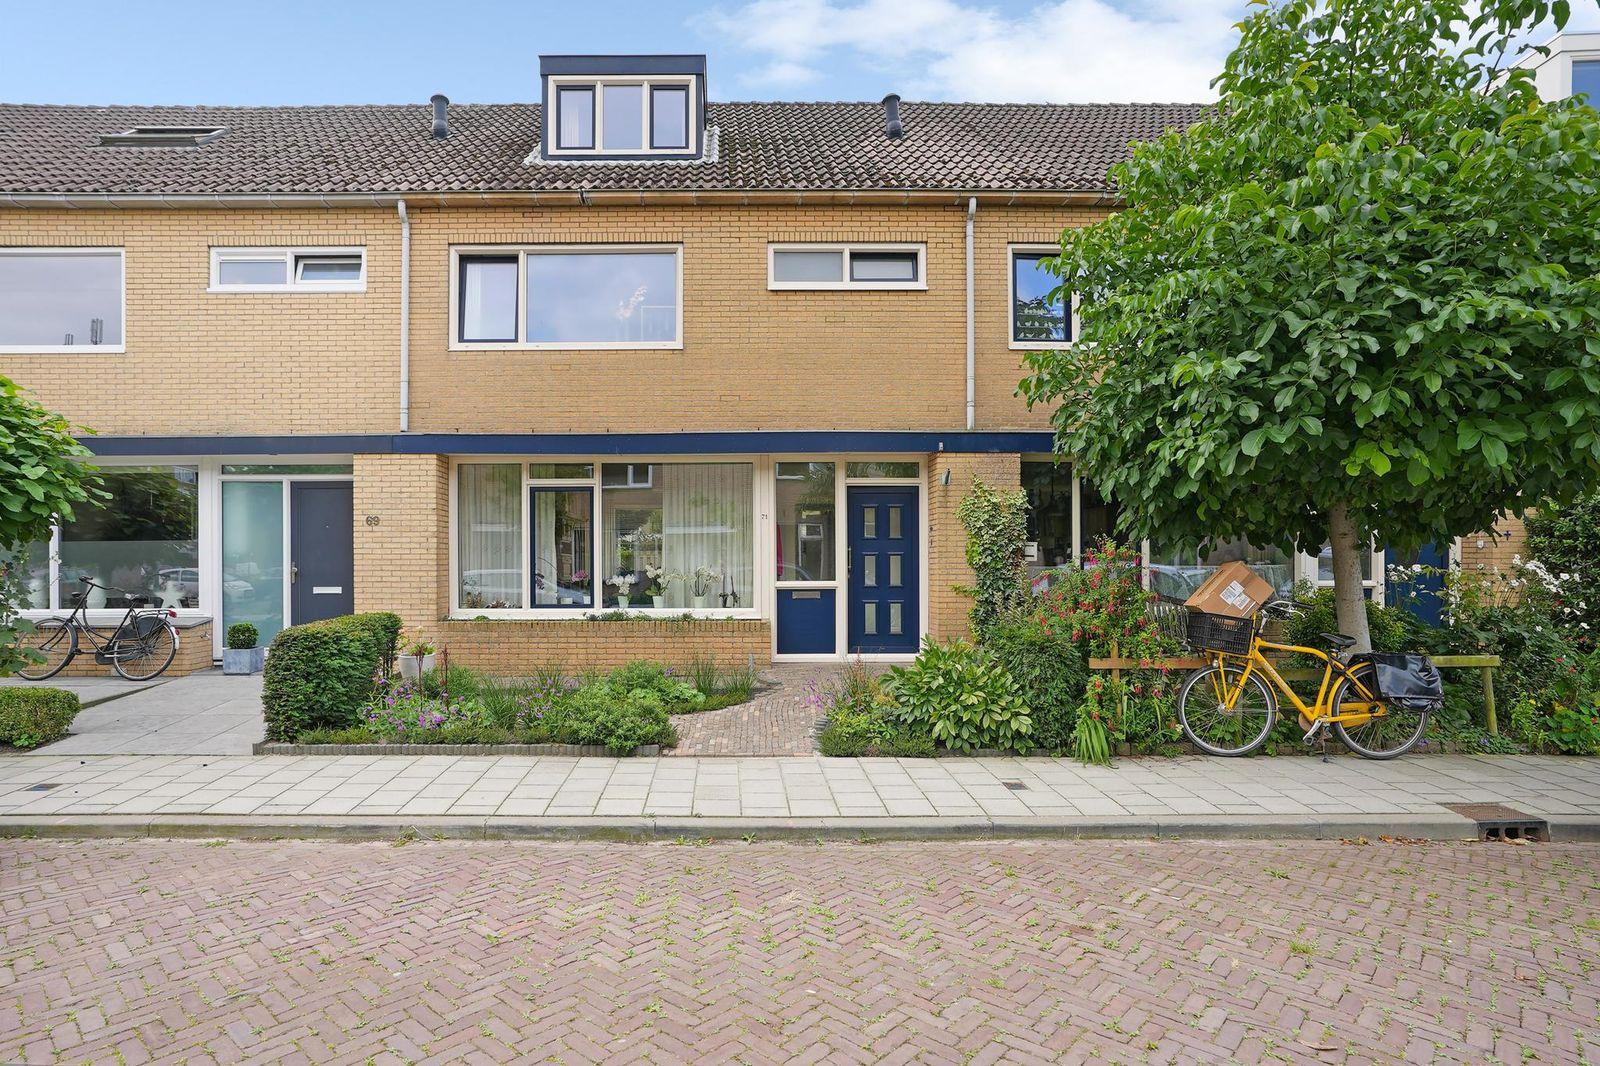 Mazzinilaan 71, Middelburg